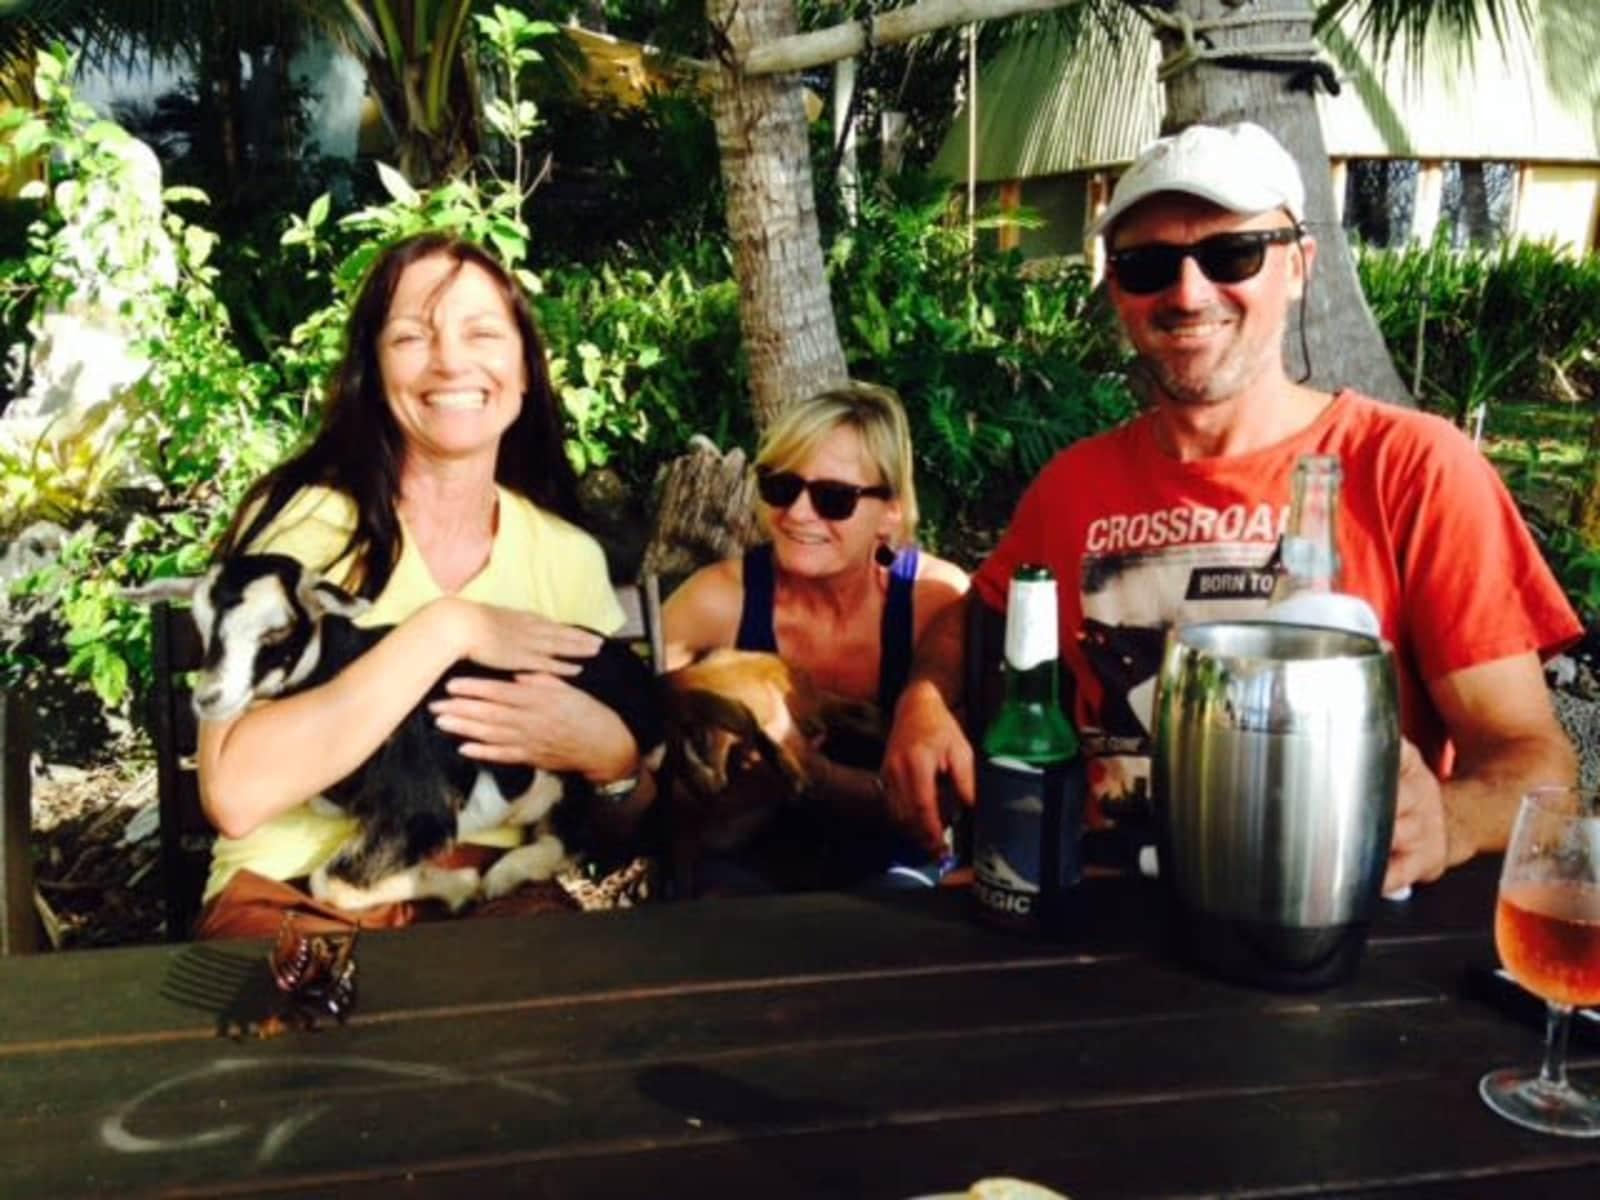 Heather from Gold Coast, Queensland, Australia